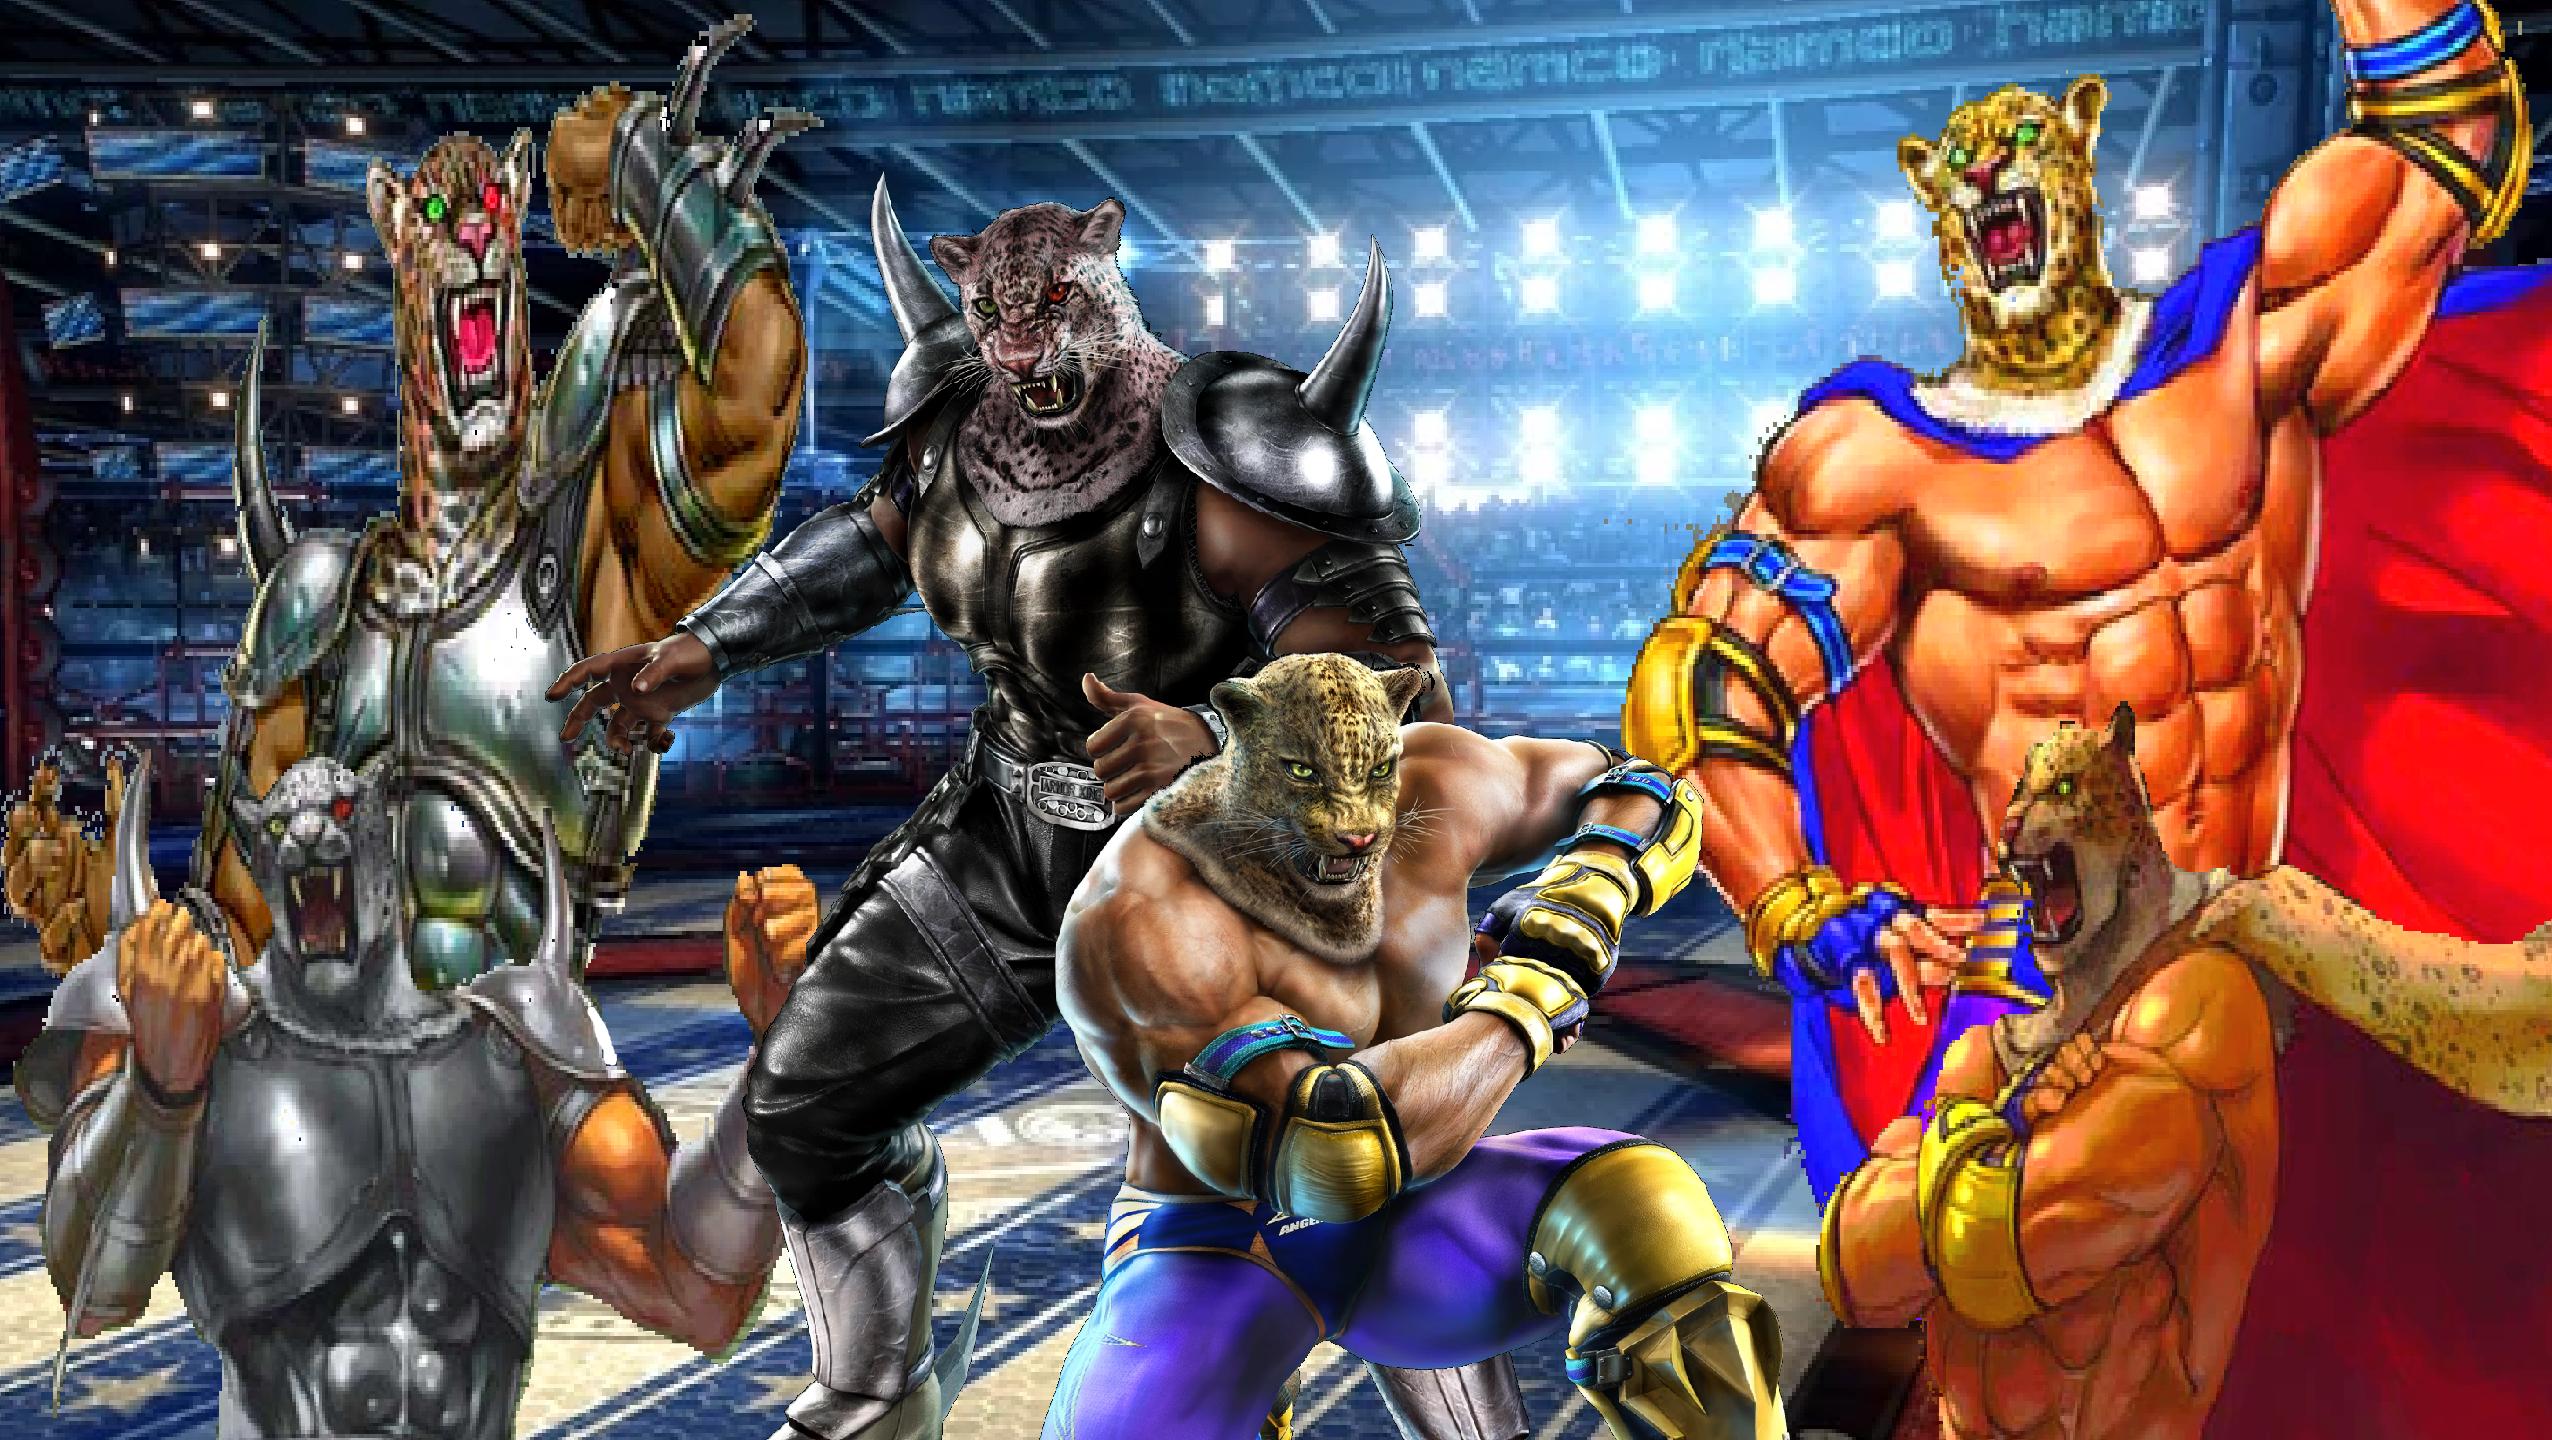 Tekken Tag Tournament 2 Armor King Ll King Ll By Lonerpx On Deviantart